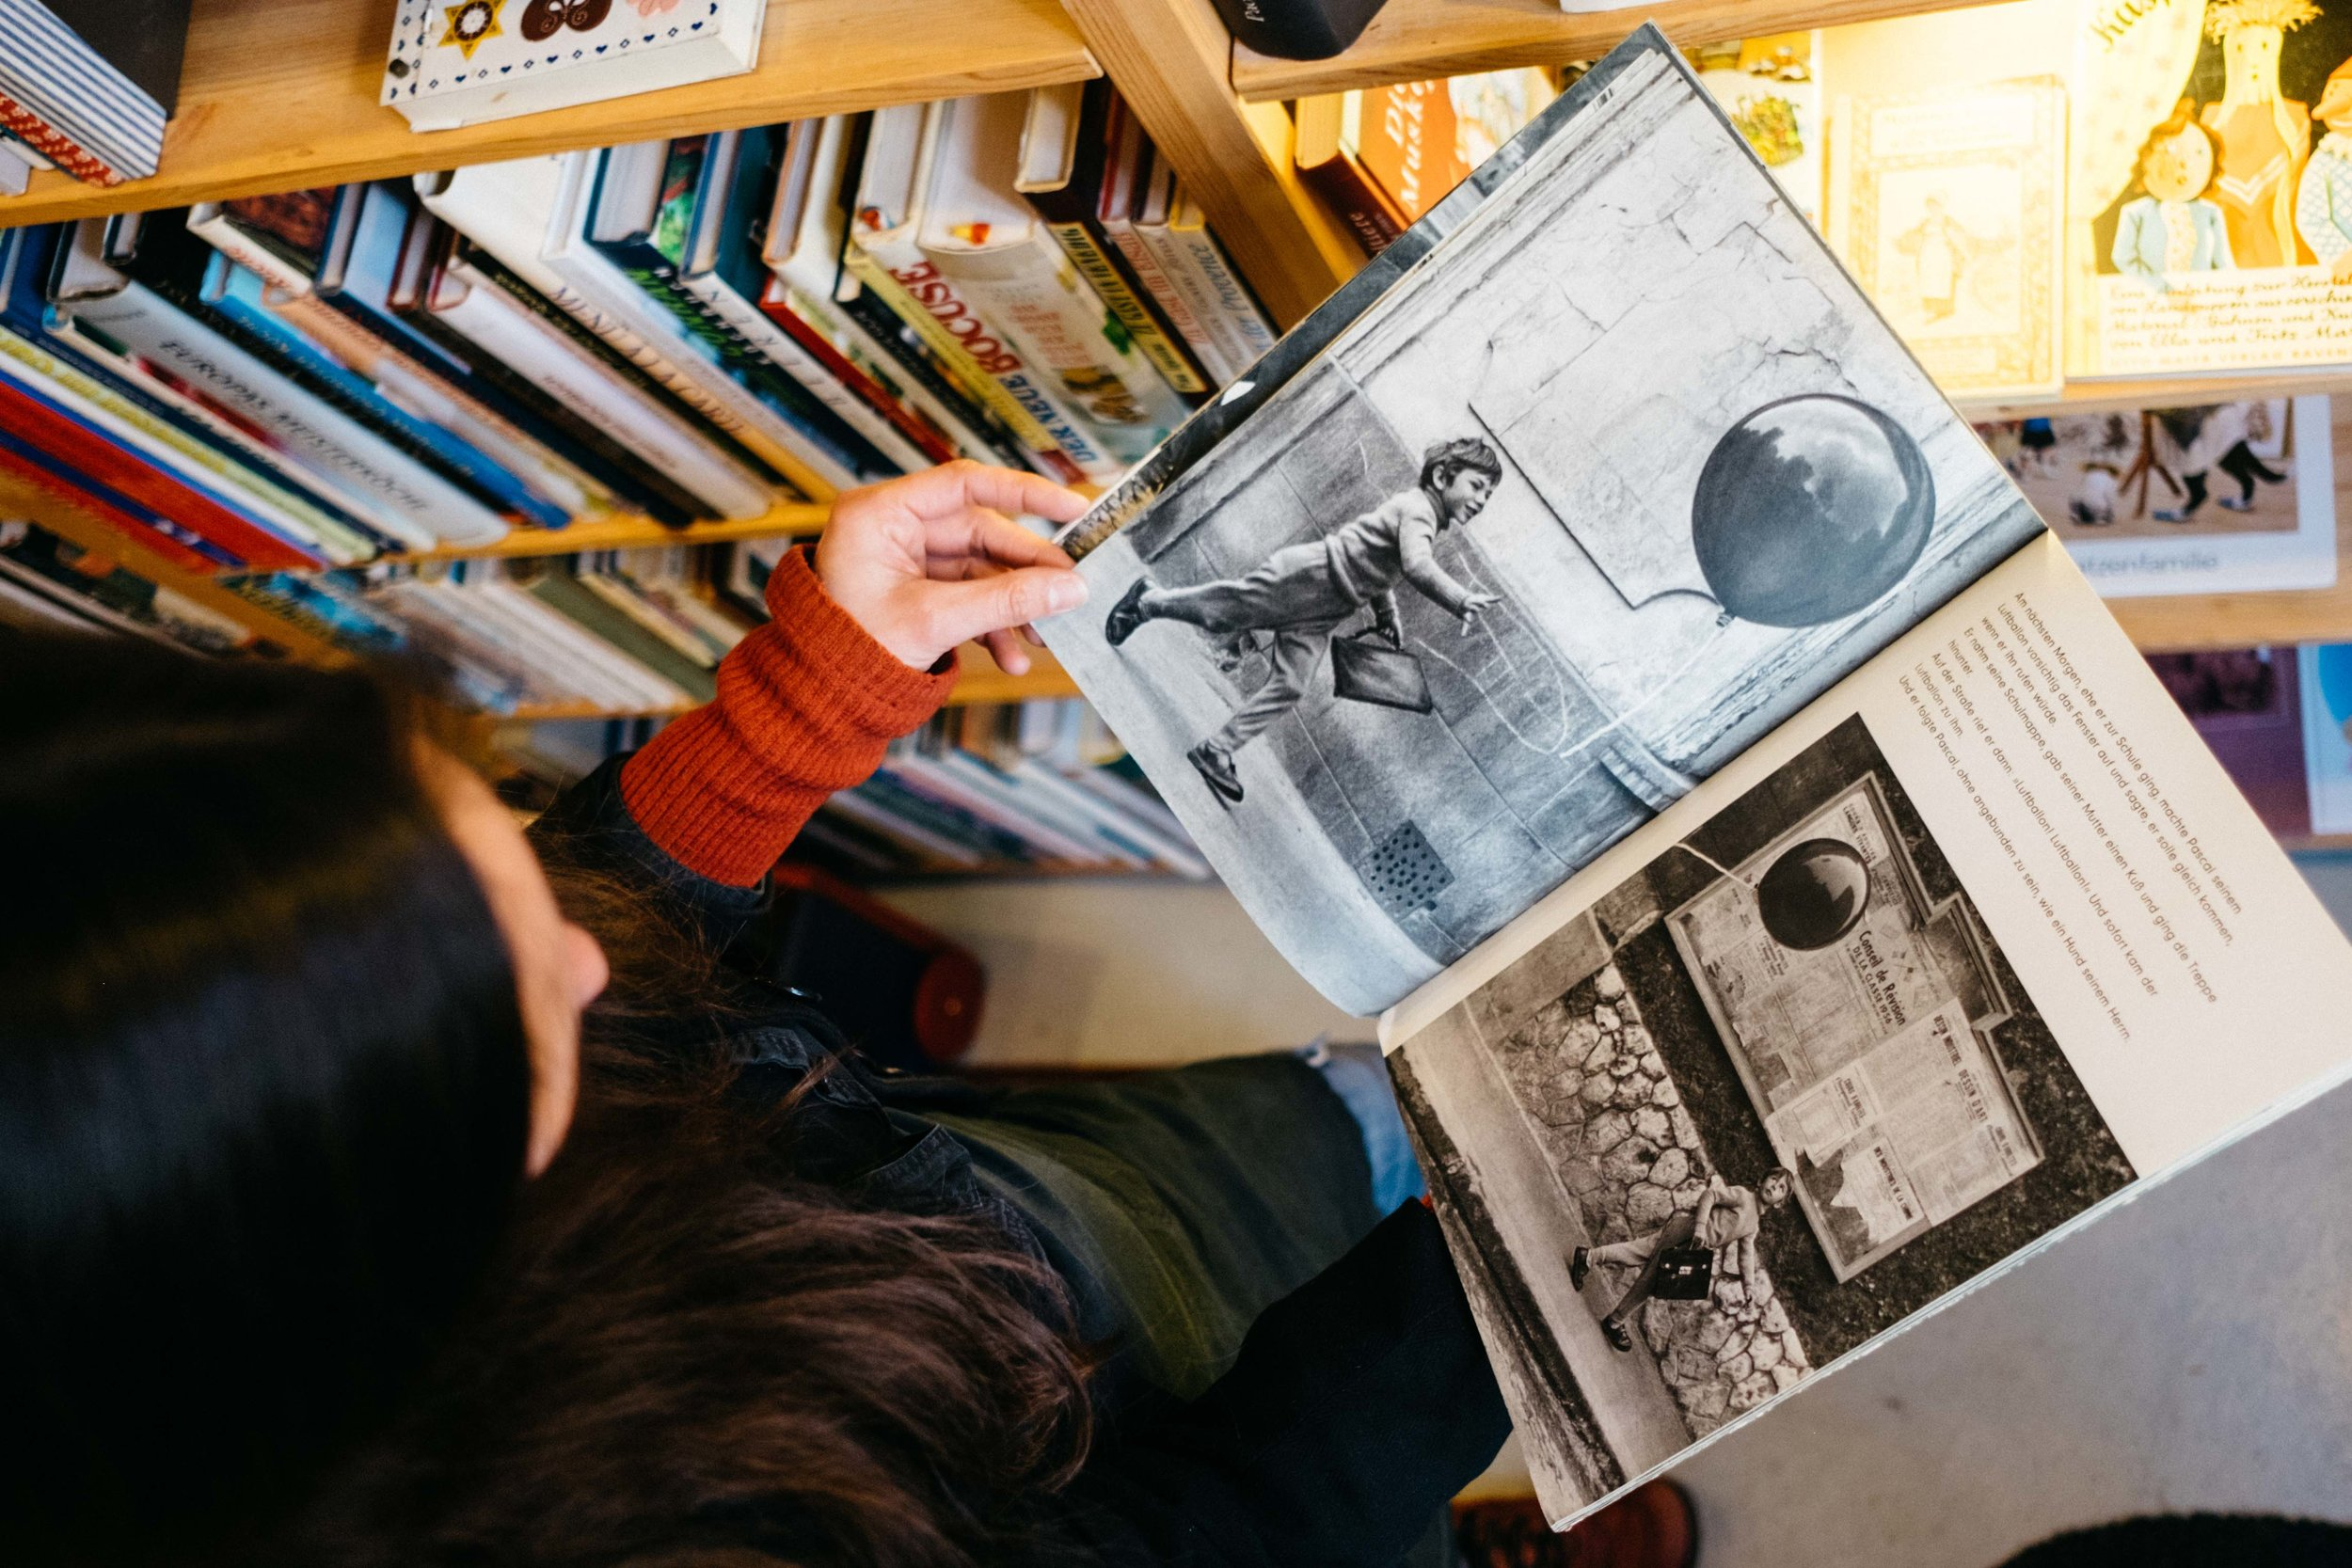 antiquariat-langguth-restaurator-buch-literatur-koeln-wearecity-atheneadiapoulis-64.jpg